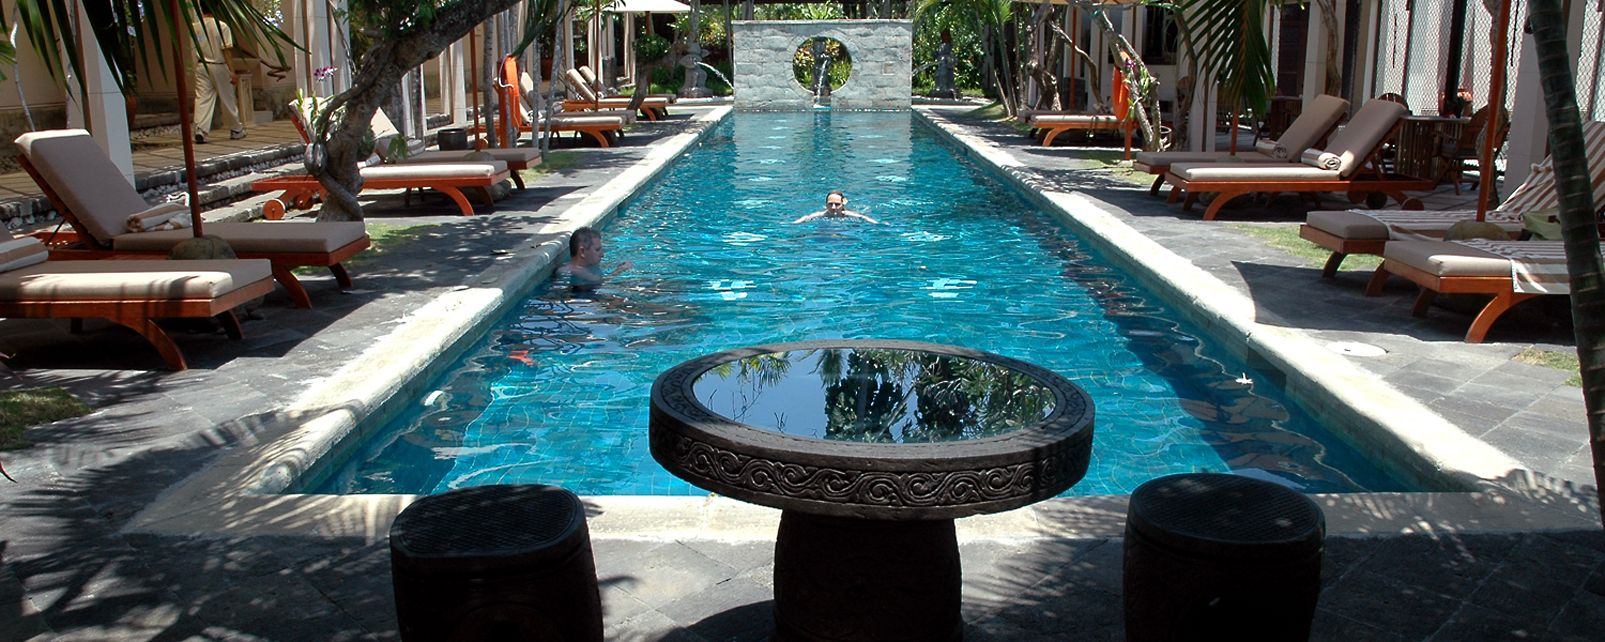 Nusa Dua Beach Hotel Spa Kabupaten Badung Bali Indonesien